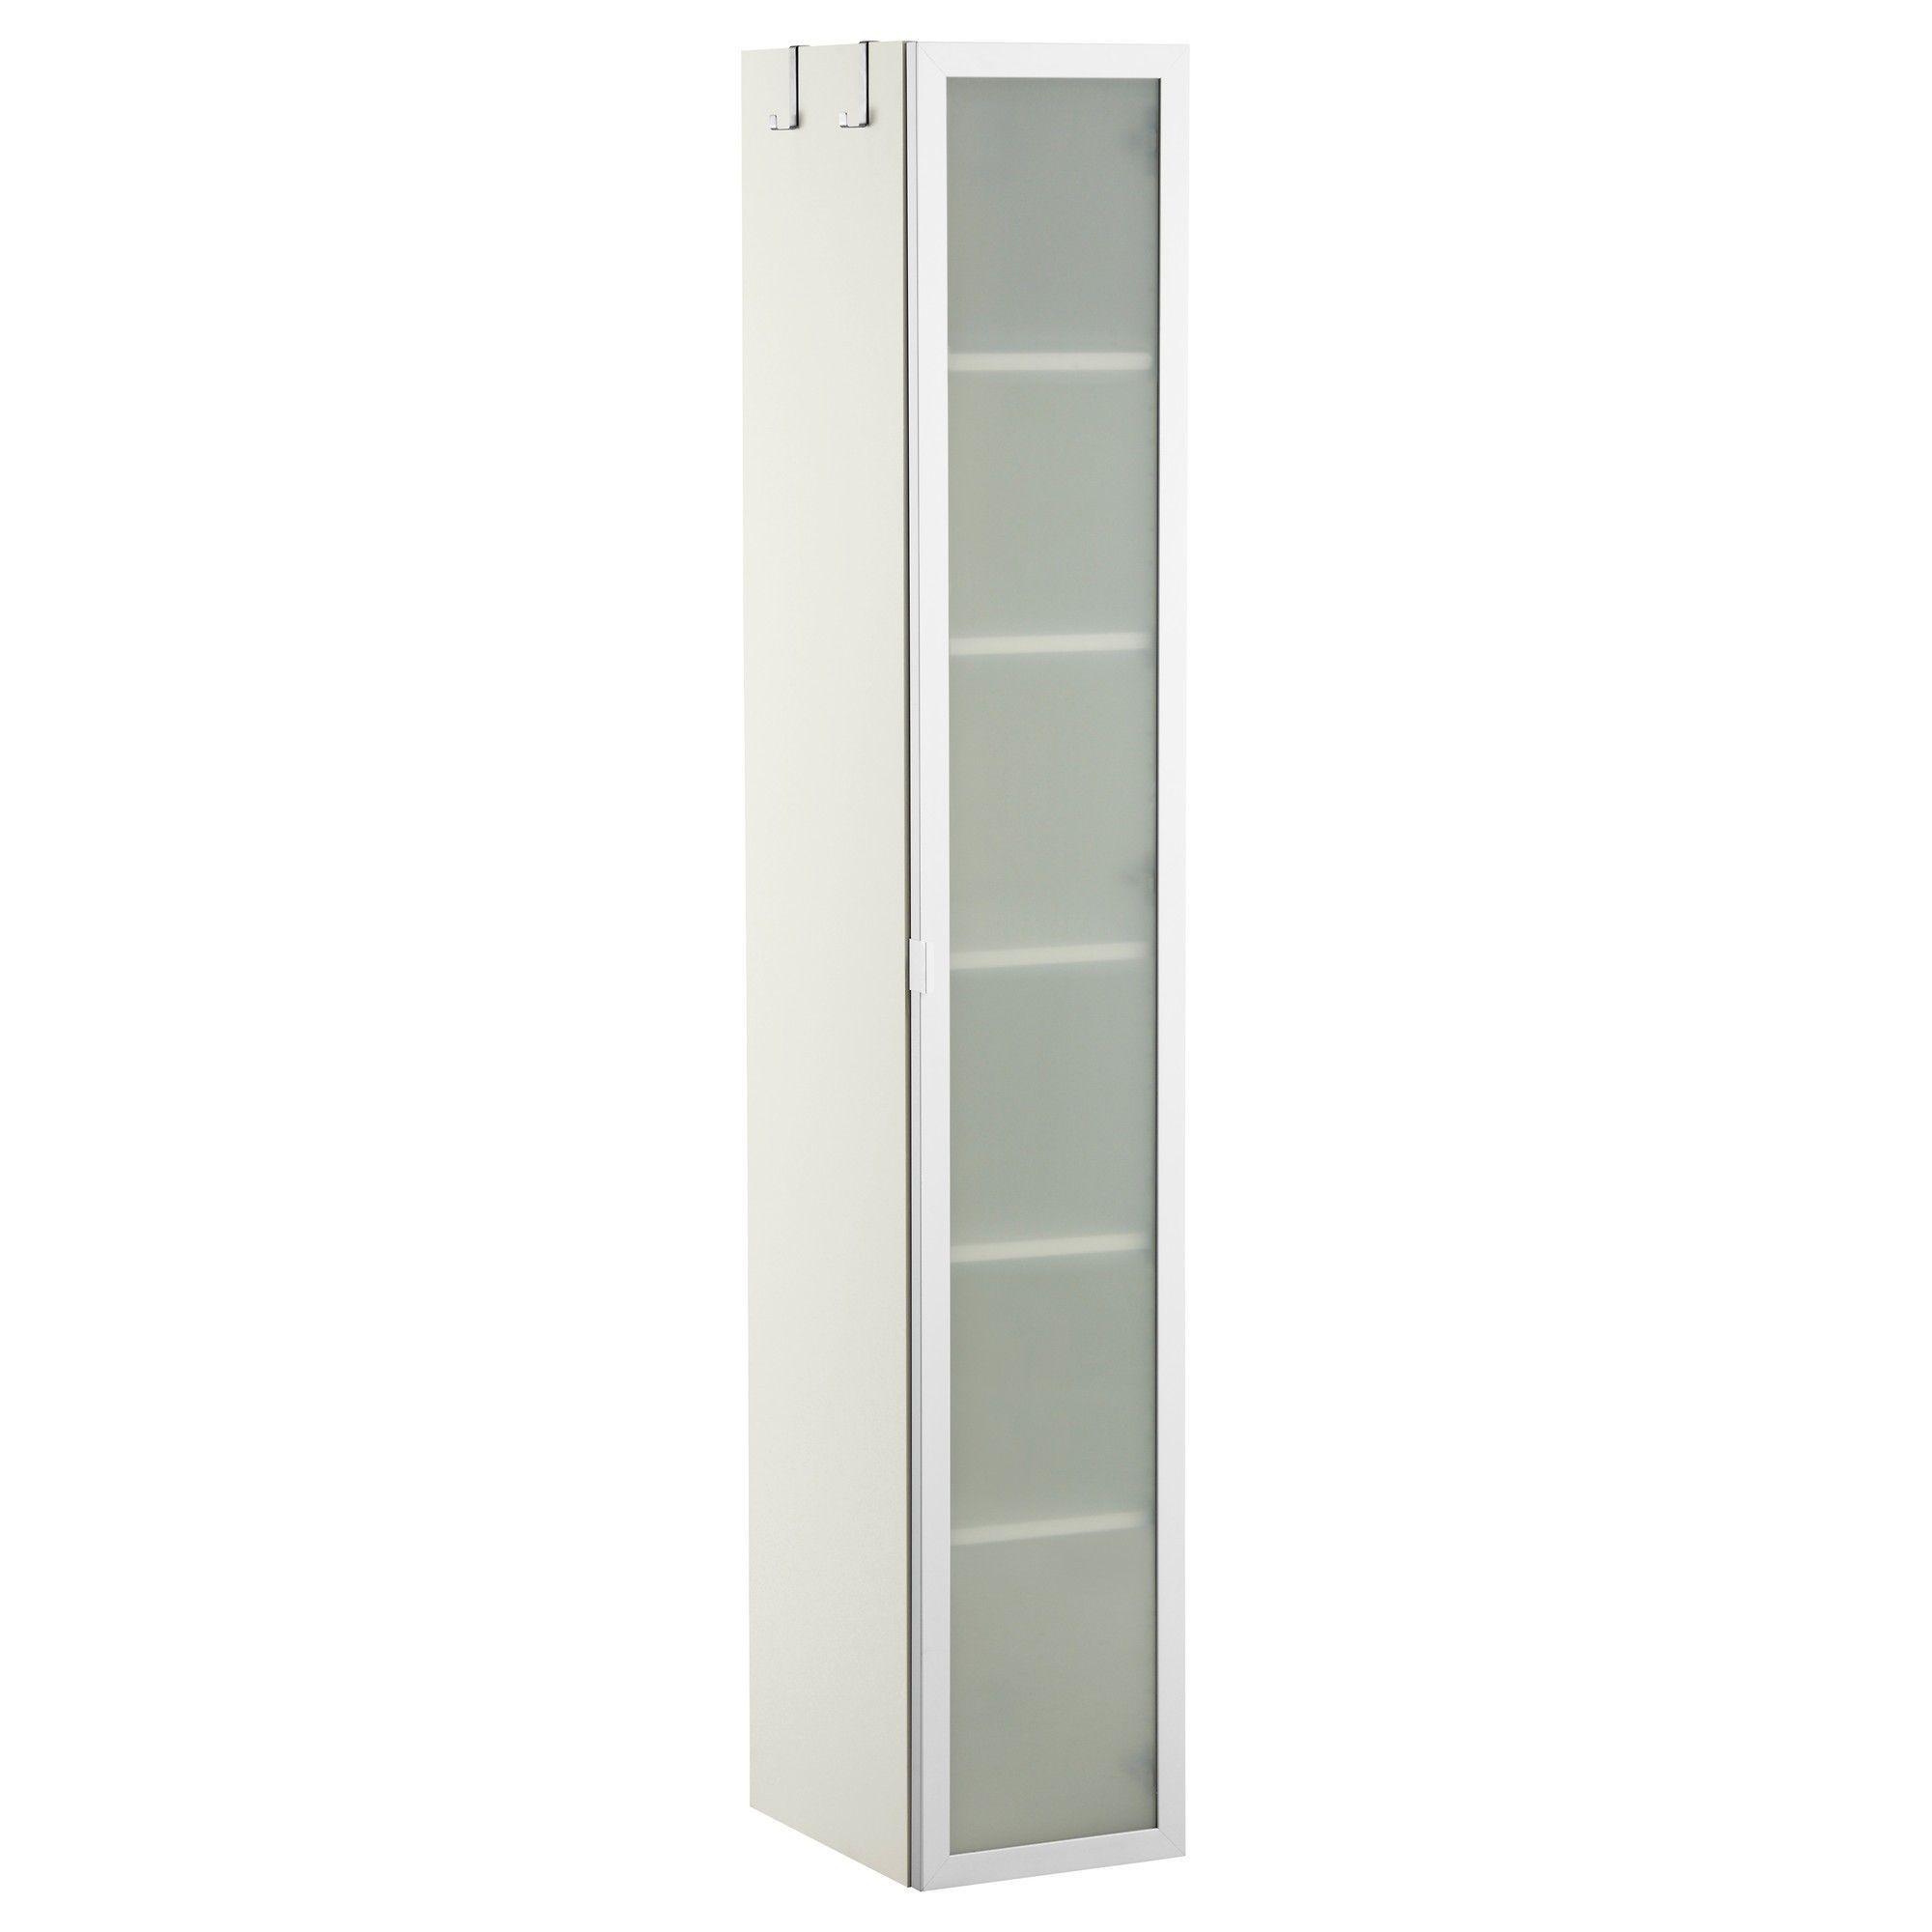 Ikea Bathroom Unit Tall in 4  Bathroom cabinets for sale